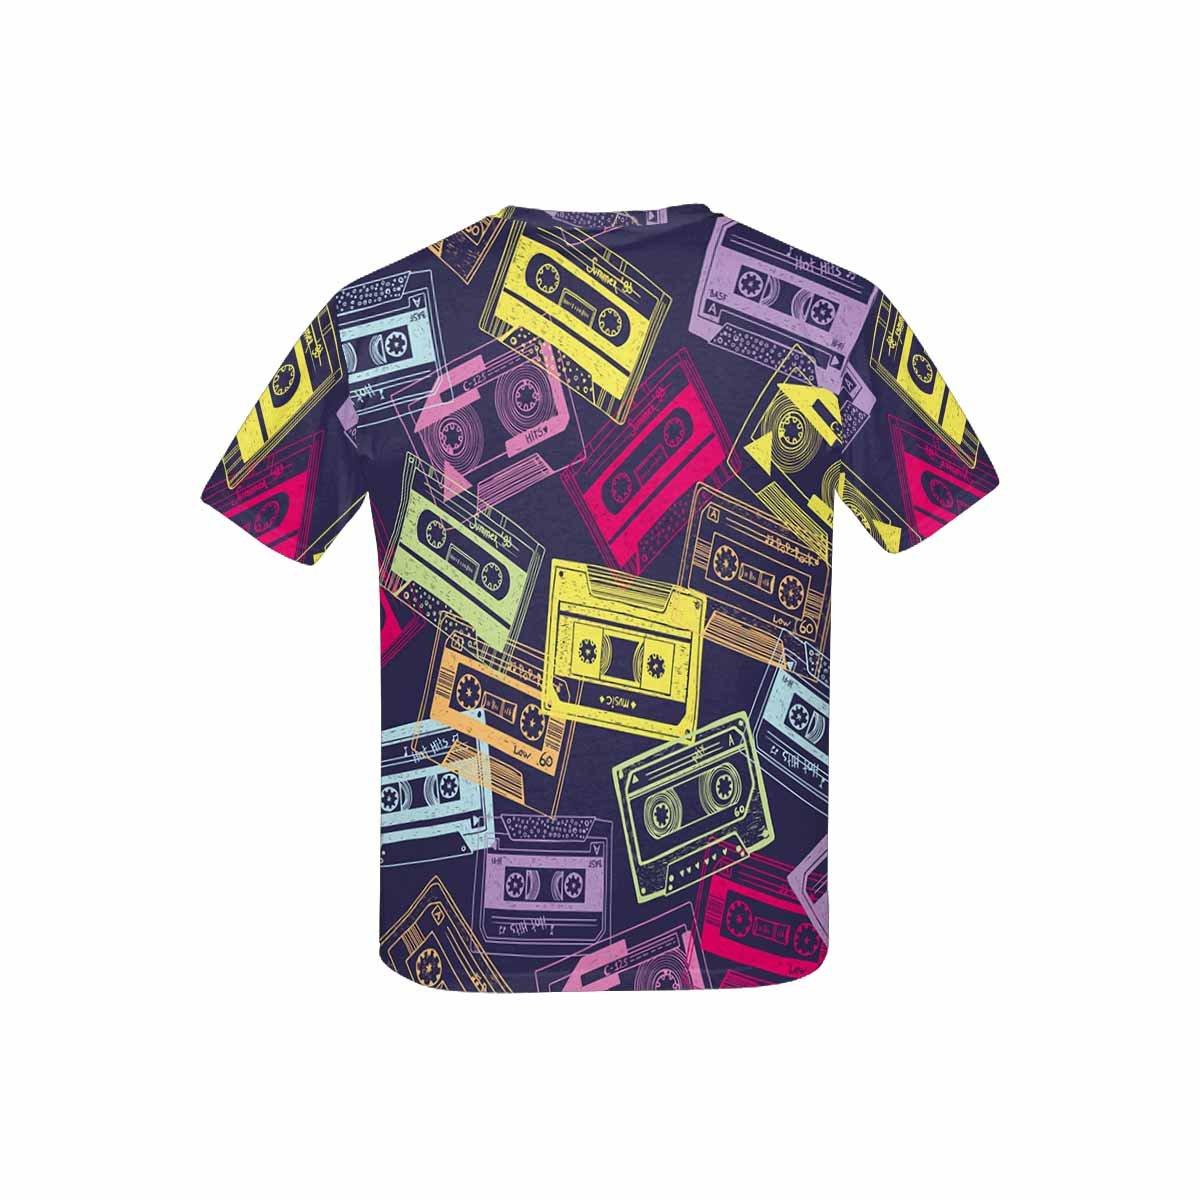 XS-XL INTERESTPRINT Youth T-Shirts Hipster Cartoon Music Theme